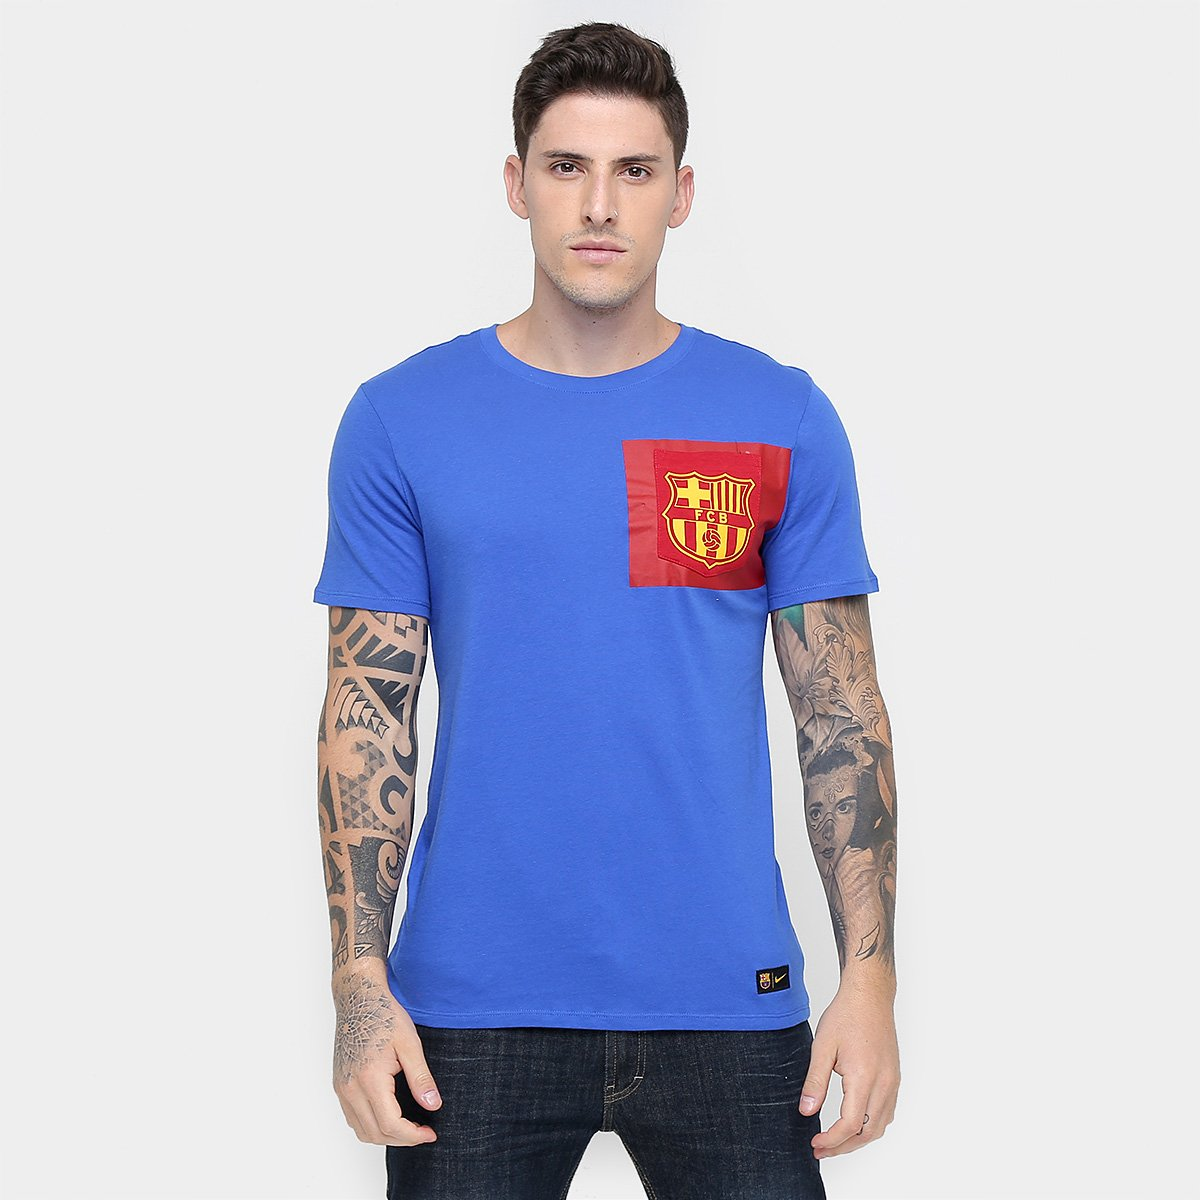 Camiseta Barcelona Nike Masculina - Compre Agora  93efc502f1cb2